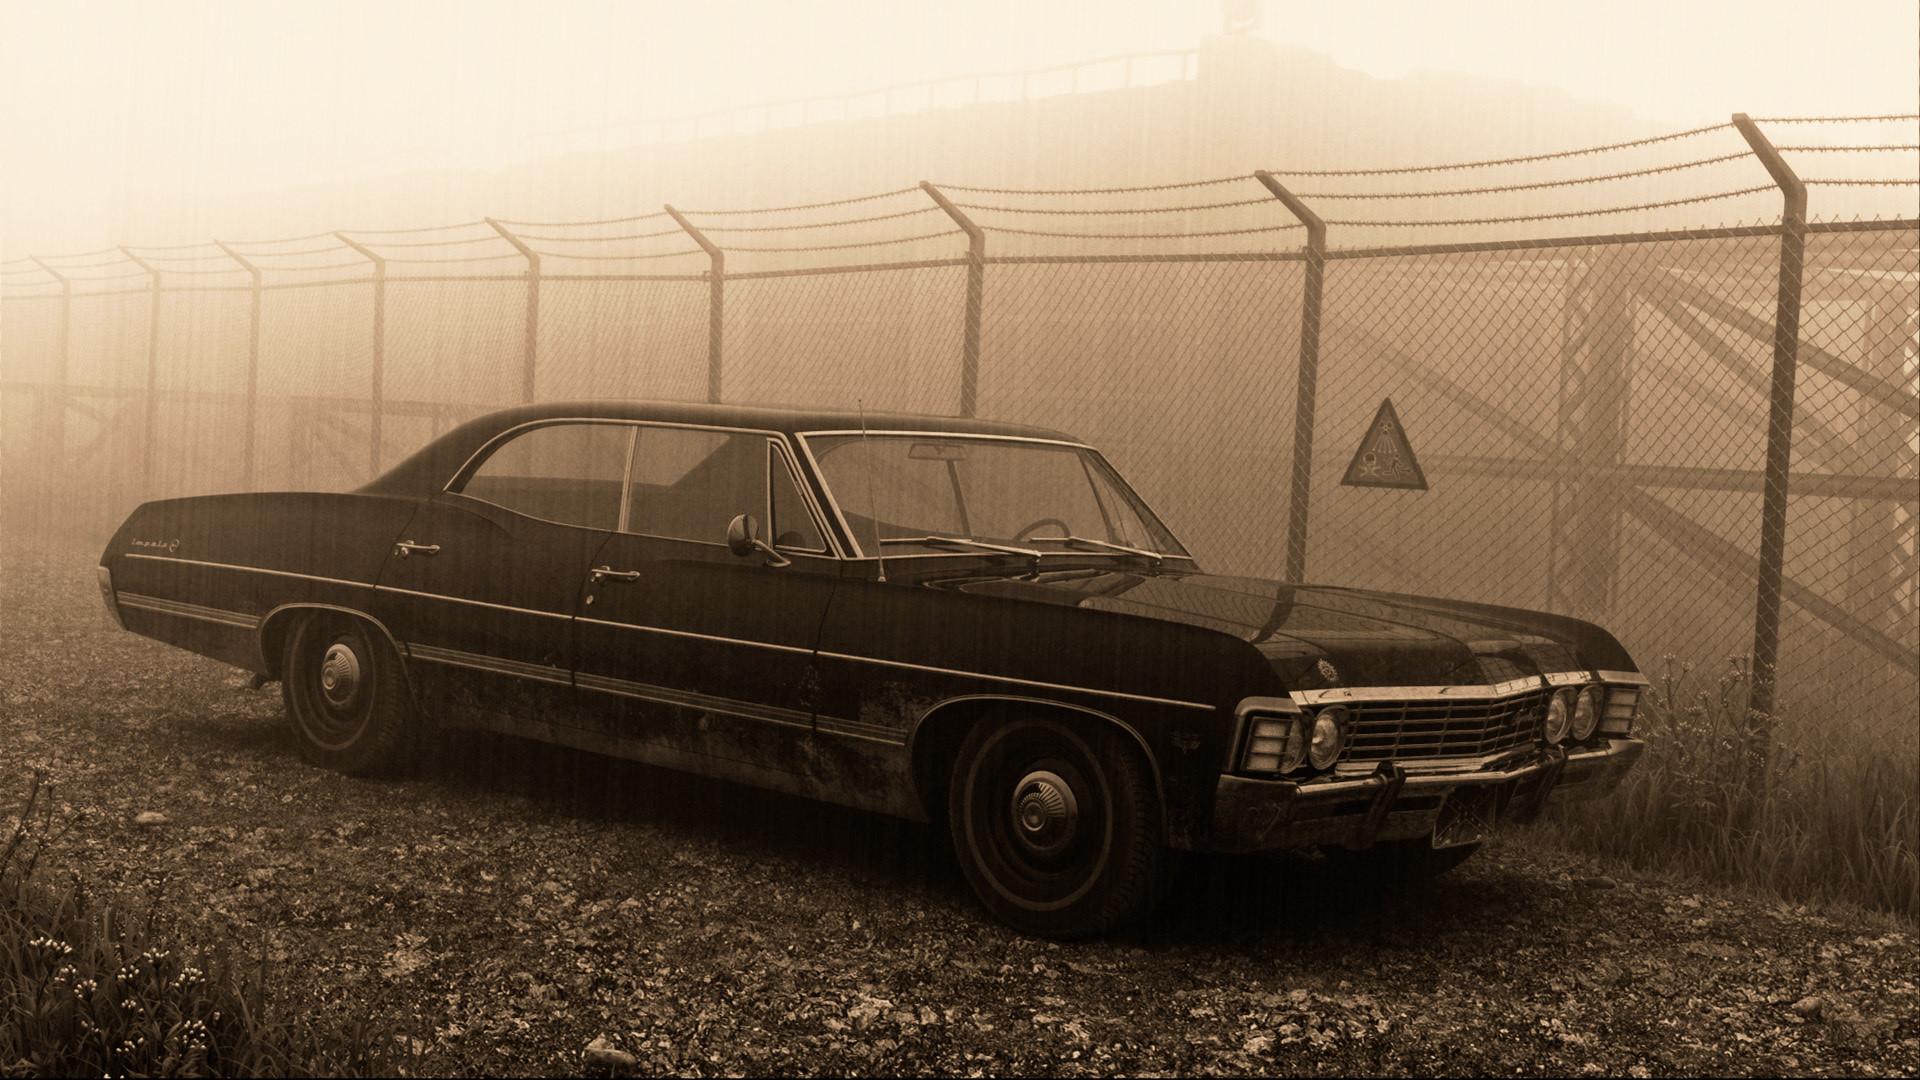 1967 Chevy Impala Supernatural, chevrolet impala iphone wallpaper .